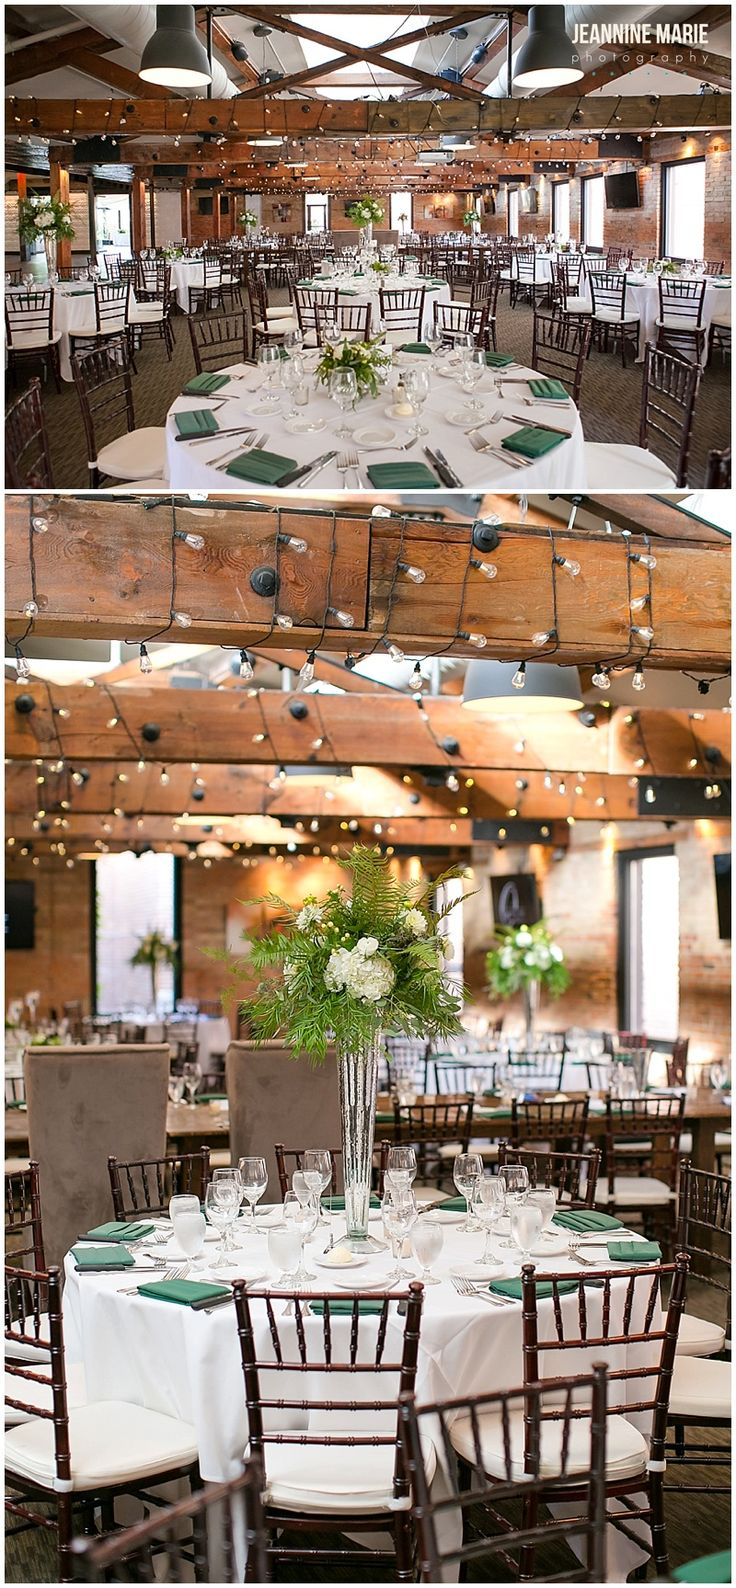 wedding reception minnetonkmn%0A Wedding reception decor and centerpieces for guest tables at Lowertown  Event Center  Photos by Saint Paul wedding photographer Jeannine Marie  Photo u